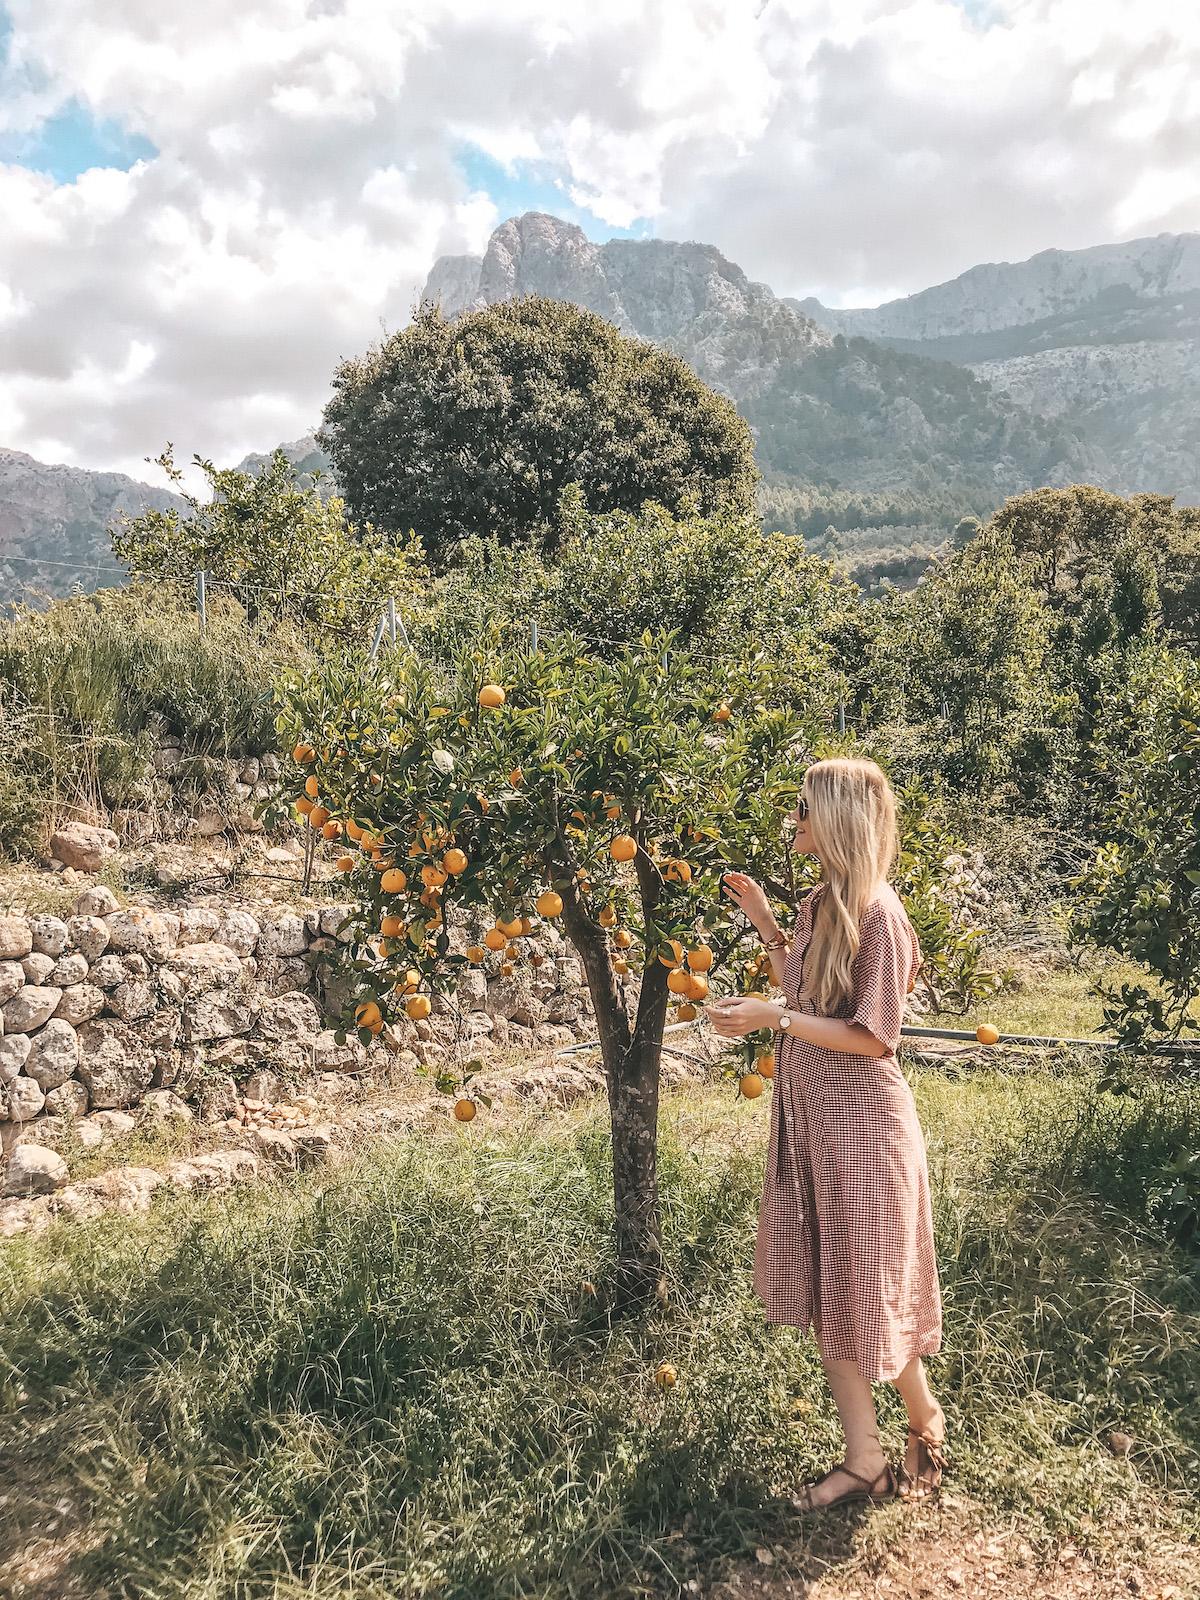 Sehenswerte Orte Mallorca Dörfer Städte Traveldiary Reisetipps Empfehlung Travelblog Orangental Soller Orangenfarm Ecovinyassa Tour